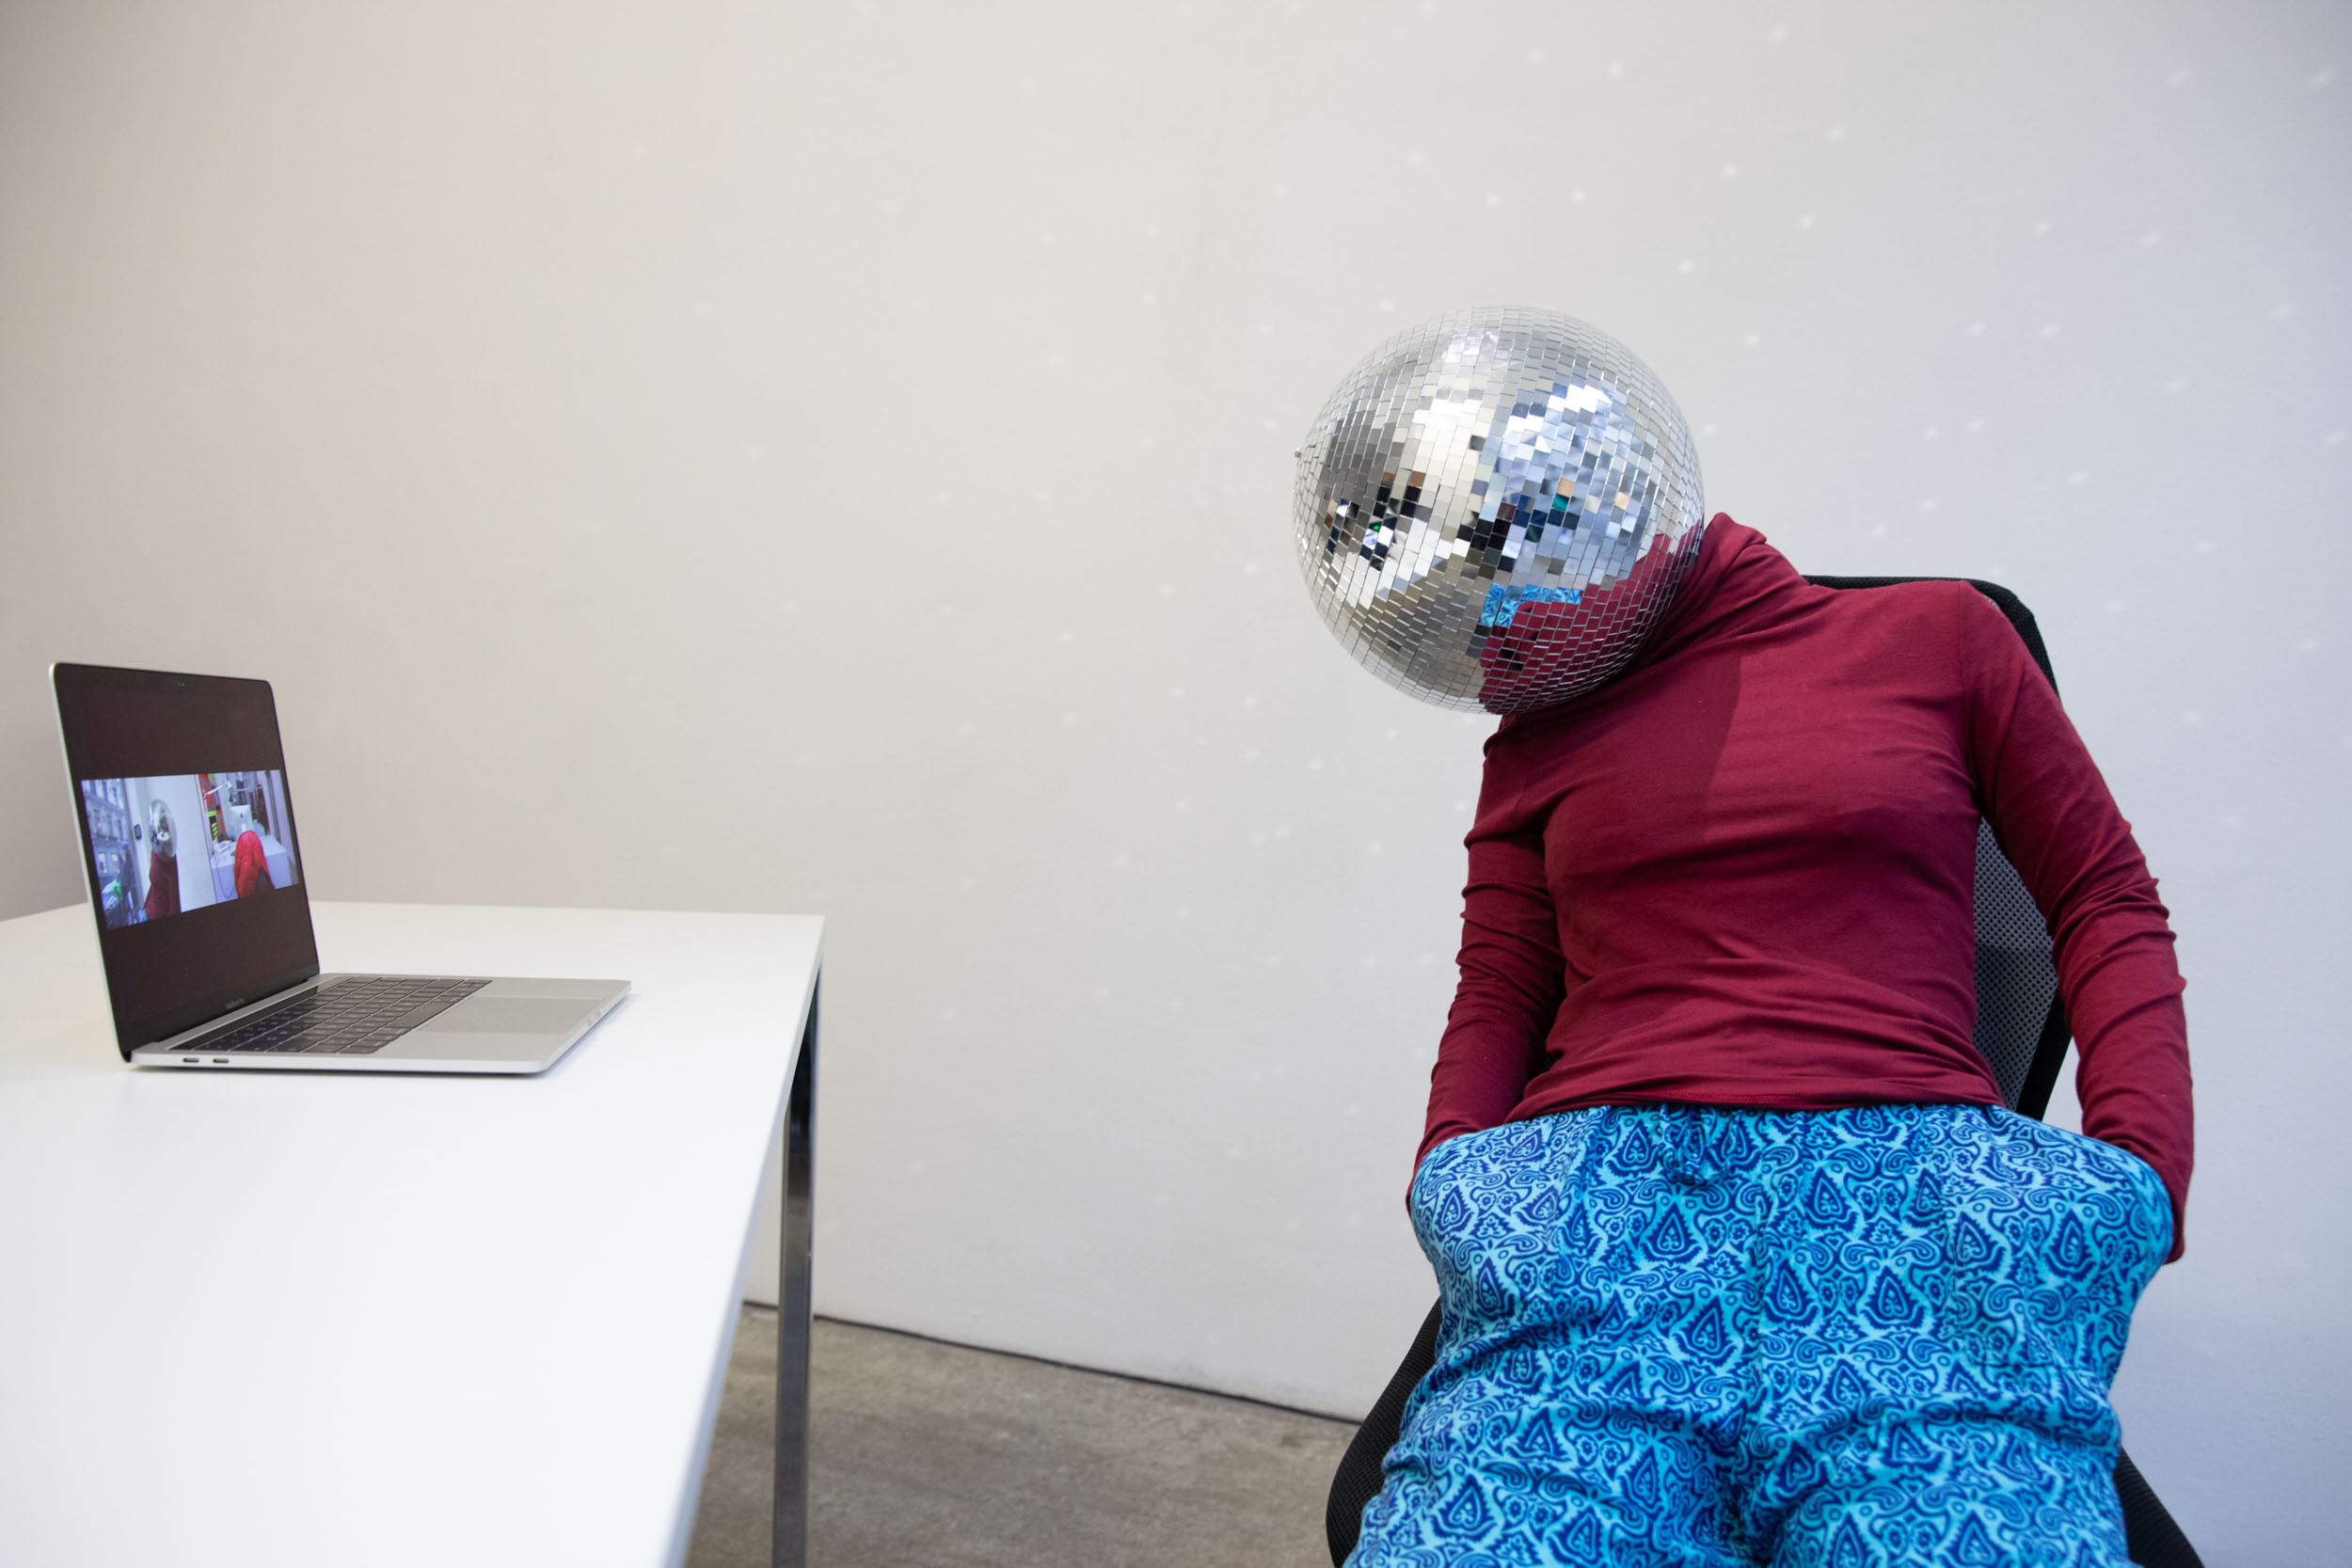 eSeL Foto: Anna Vasof & Christian Bazant-Hegemark (Untitled Projects, 12.2.-24.4.2021)